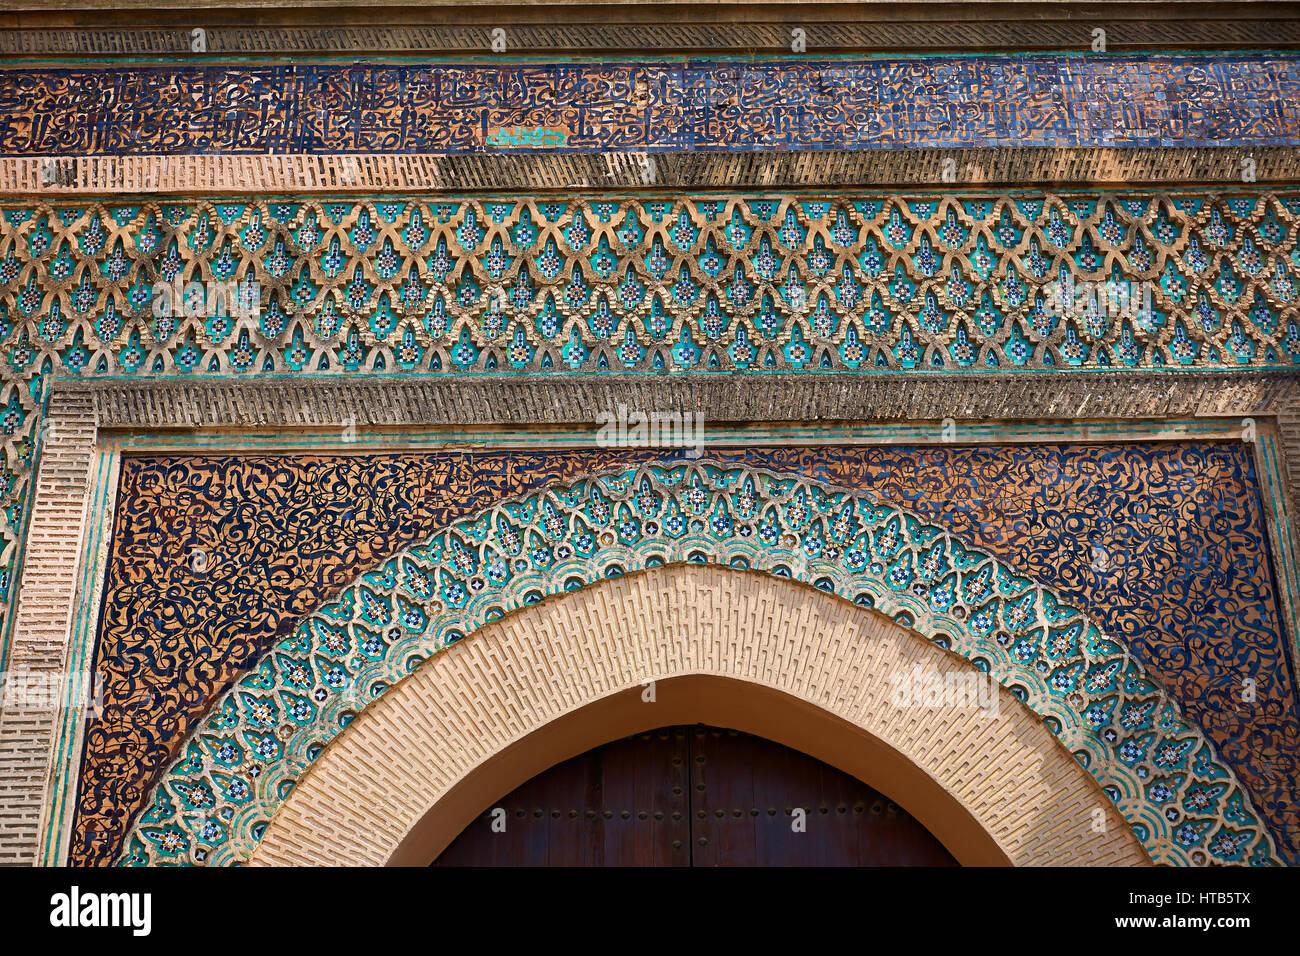 Zellij mosaics and arabesque Moorish plasterwork of the Bab Mansour gate. Named after the architect, El-Mansour, Stock Photo